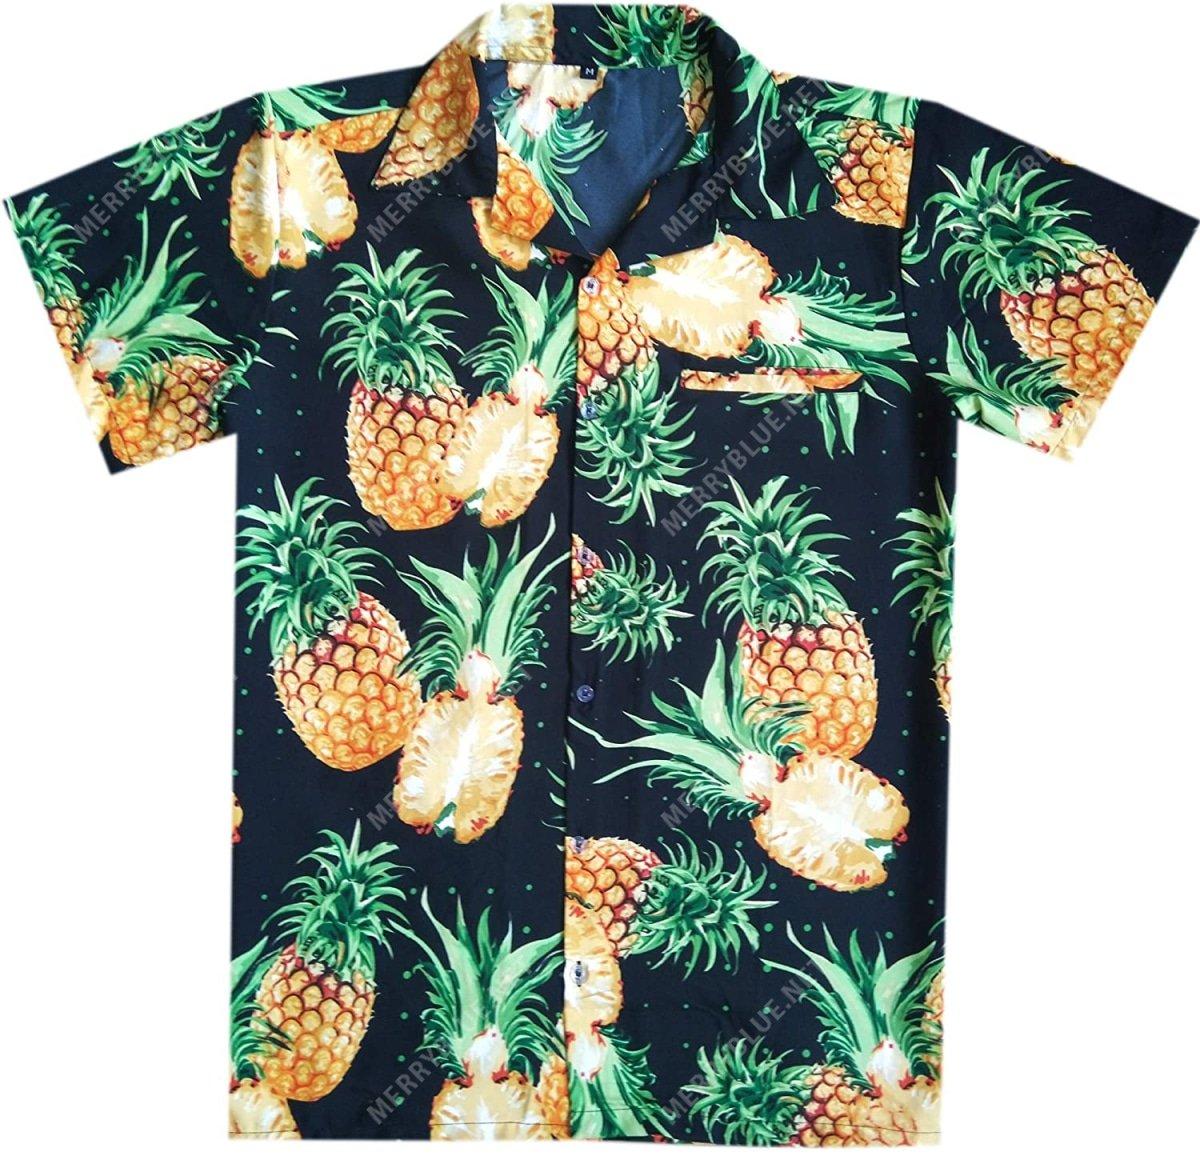 pineapple tropical all over printed hawaiian shirt 3